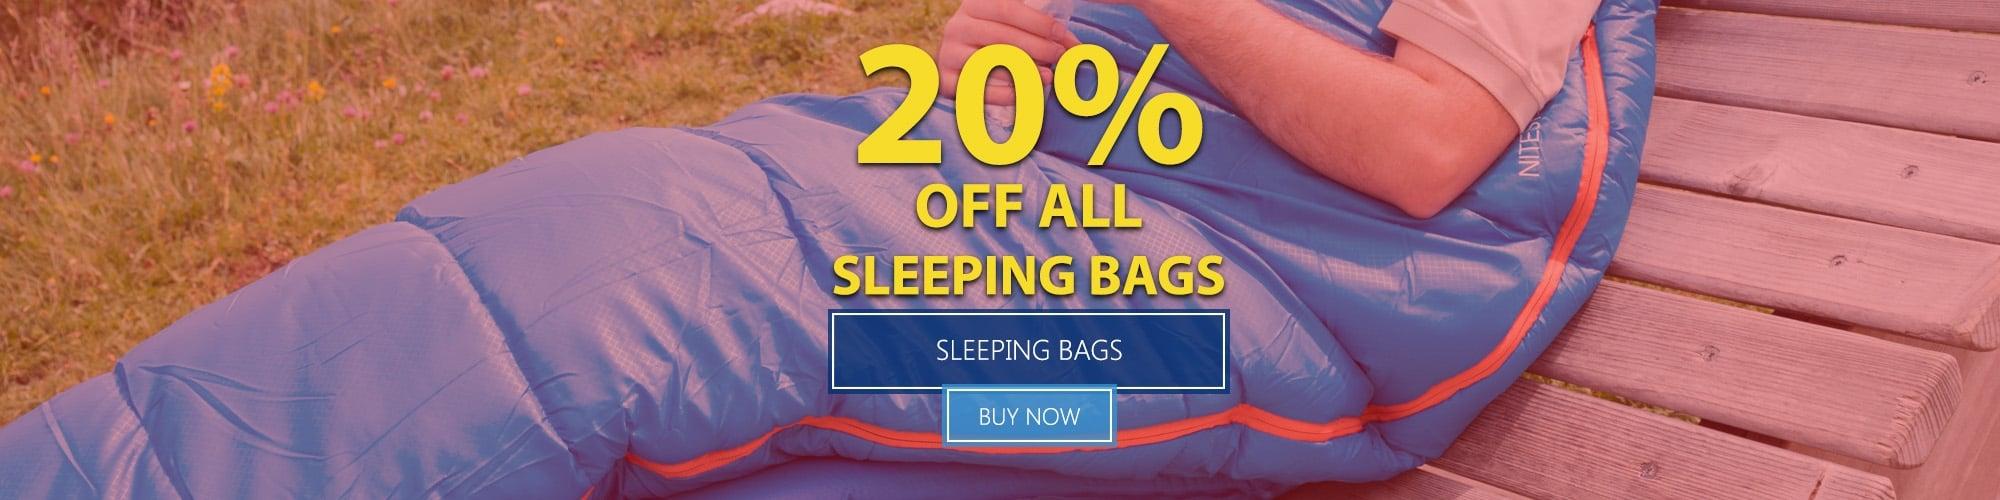 Summer Sale 2016 - 20% Off All Sleeping Bags